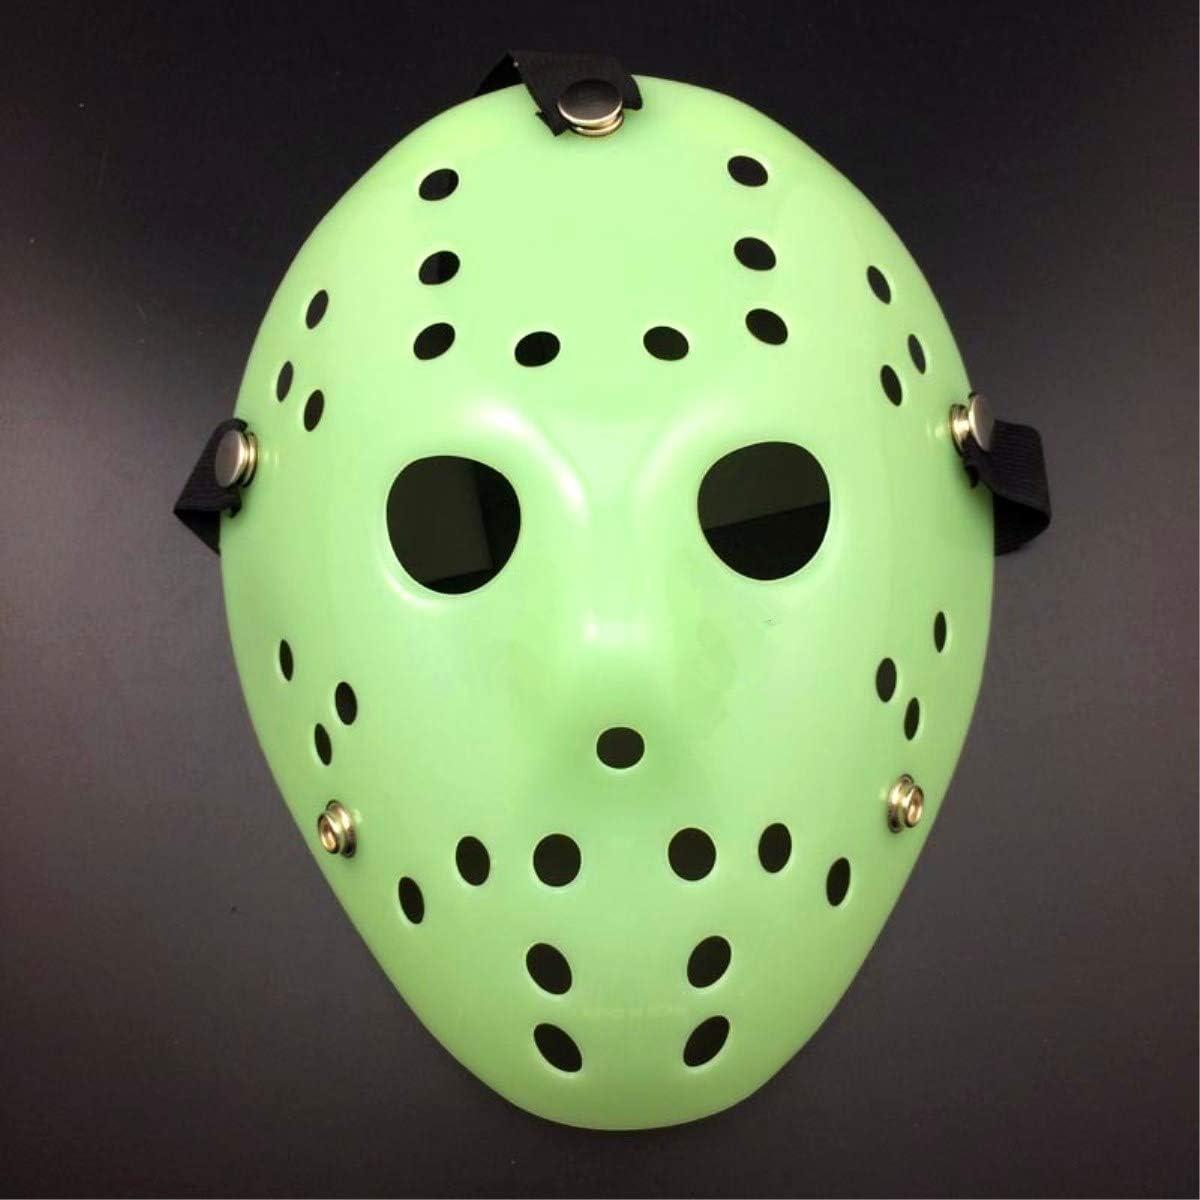 URDEAR Halloween Jason Masks Masquerade Party Cosplay Costume Masks